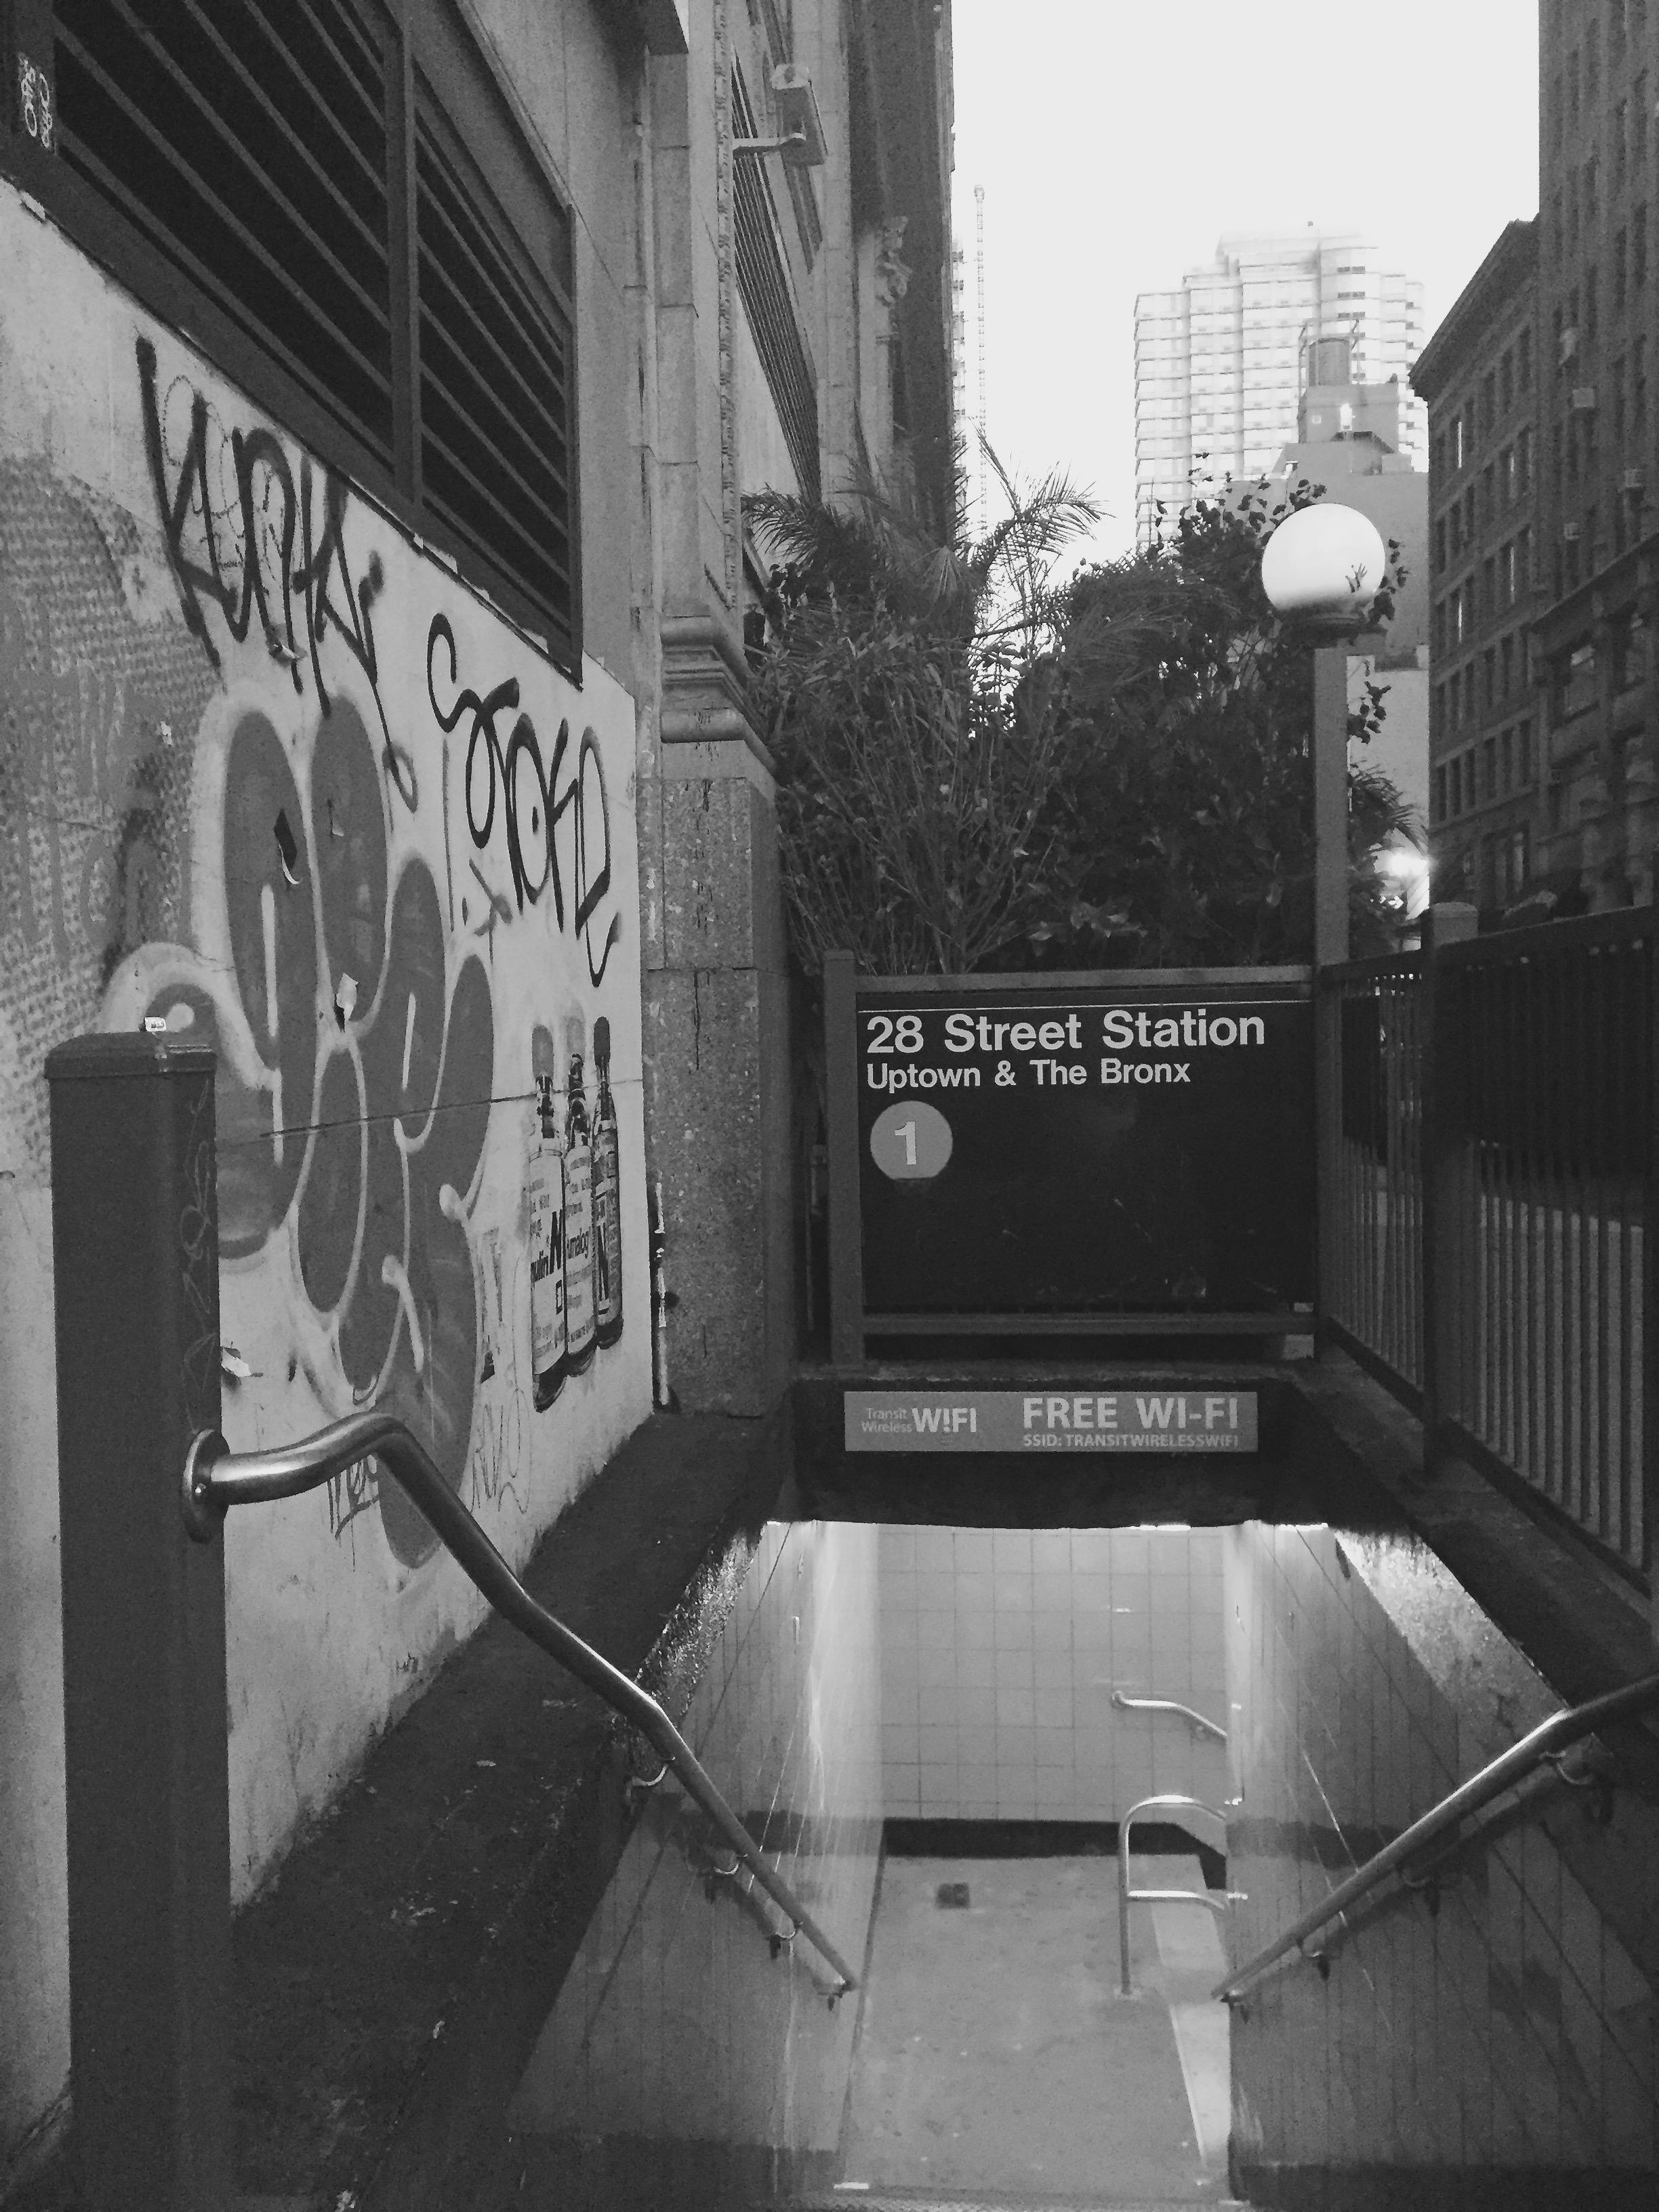 8.Uptown & The Bronx